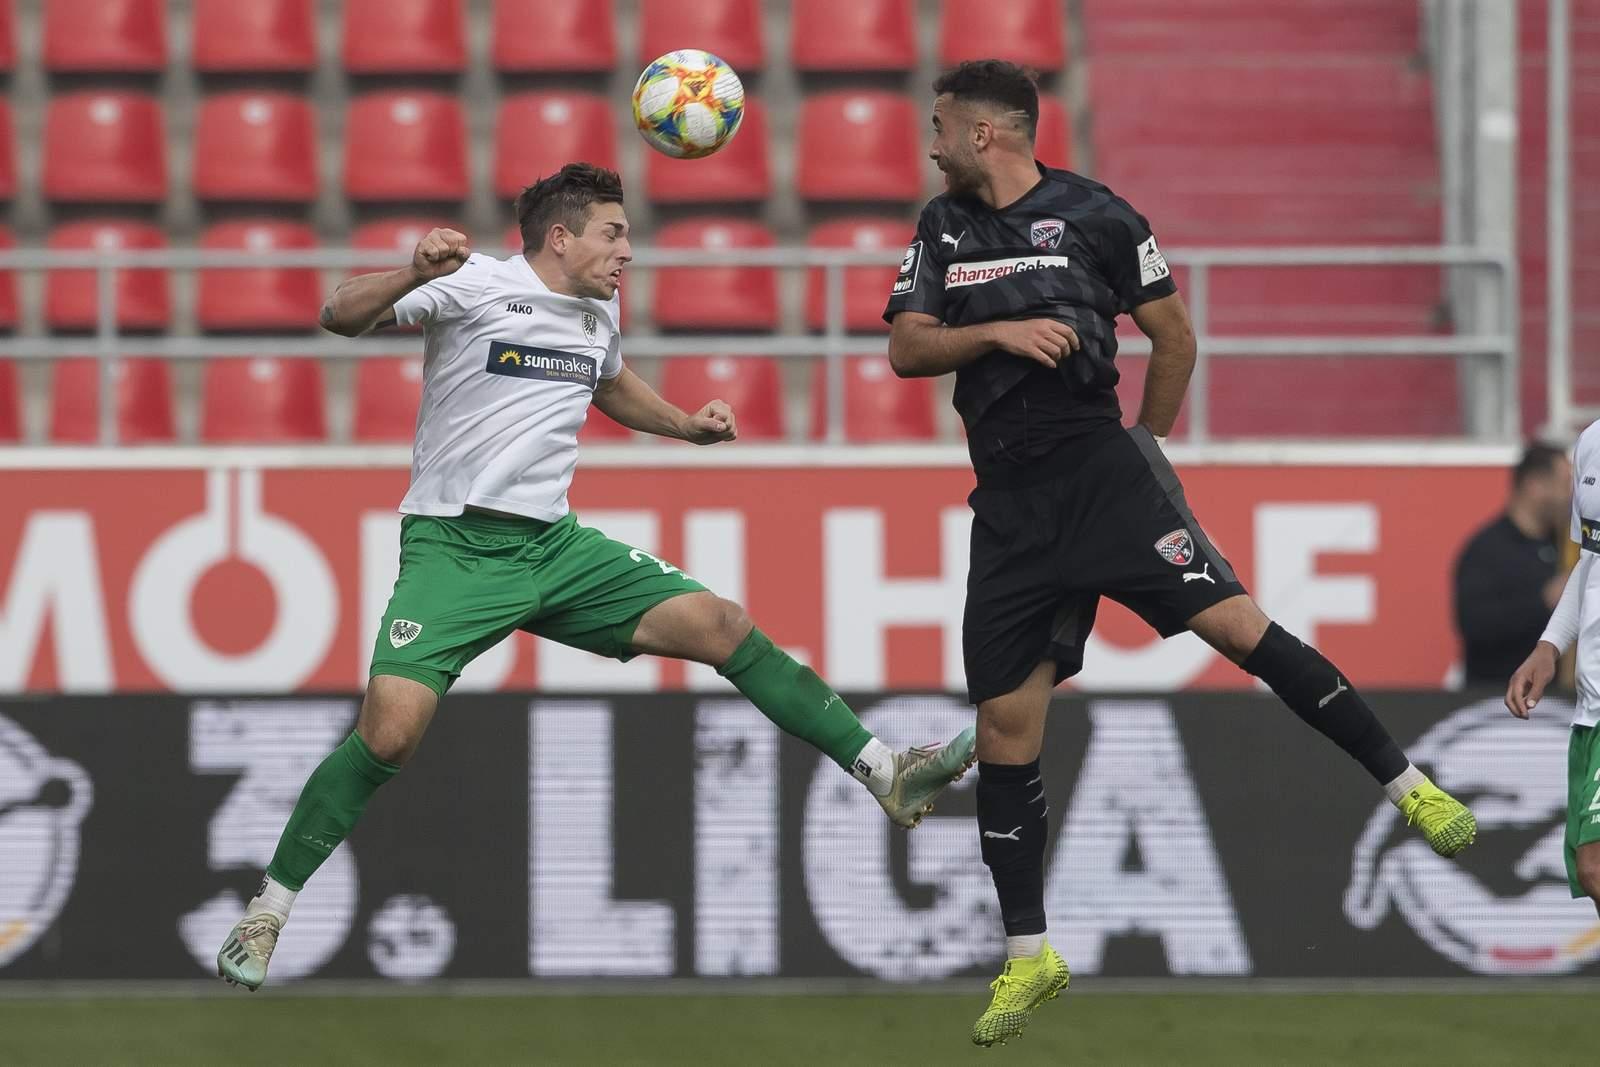 Münsters Luca Schnellbacher (l.) gegen Ingolstadts Fatih Kaya.